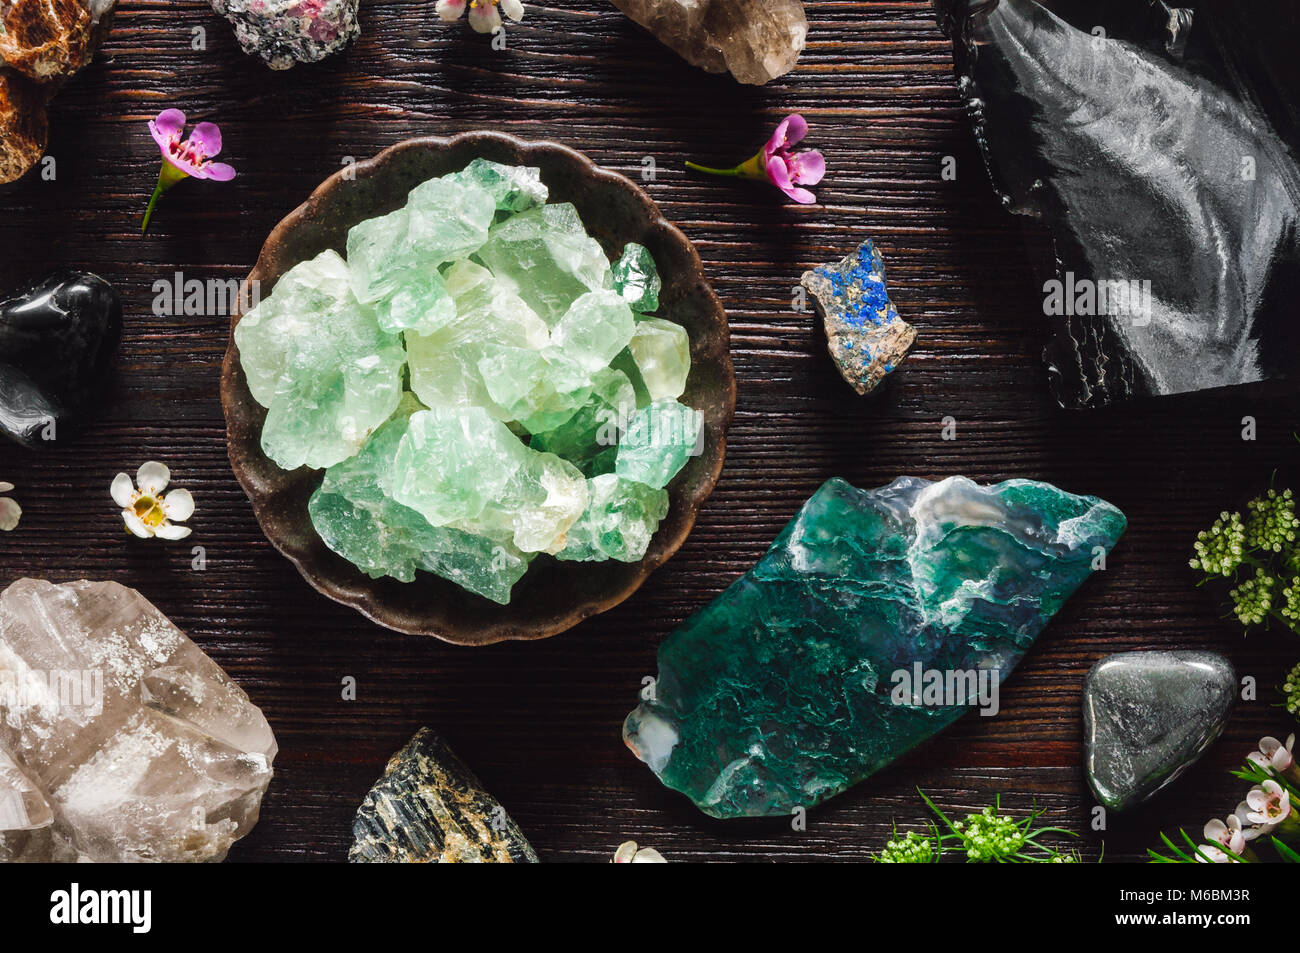 Stones of Capricorn, including Ruby, Hematite, Obsidian, Black Tourmaline, Azurite, Fluorite and Smoky Quartz - Stock Image